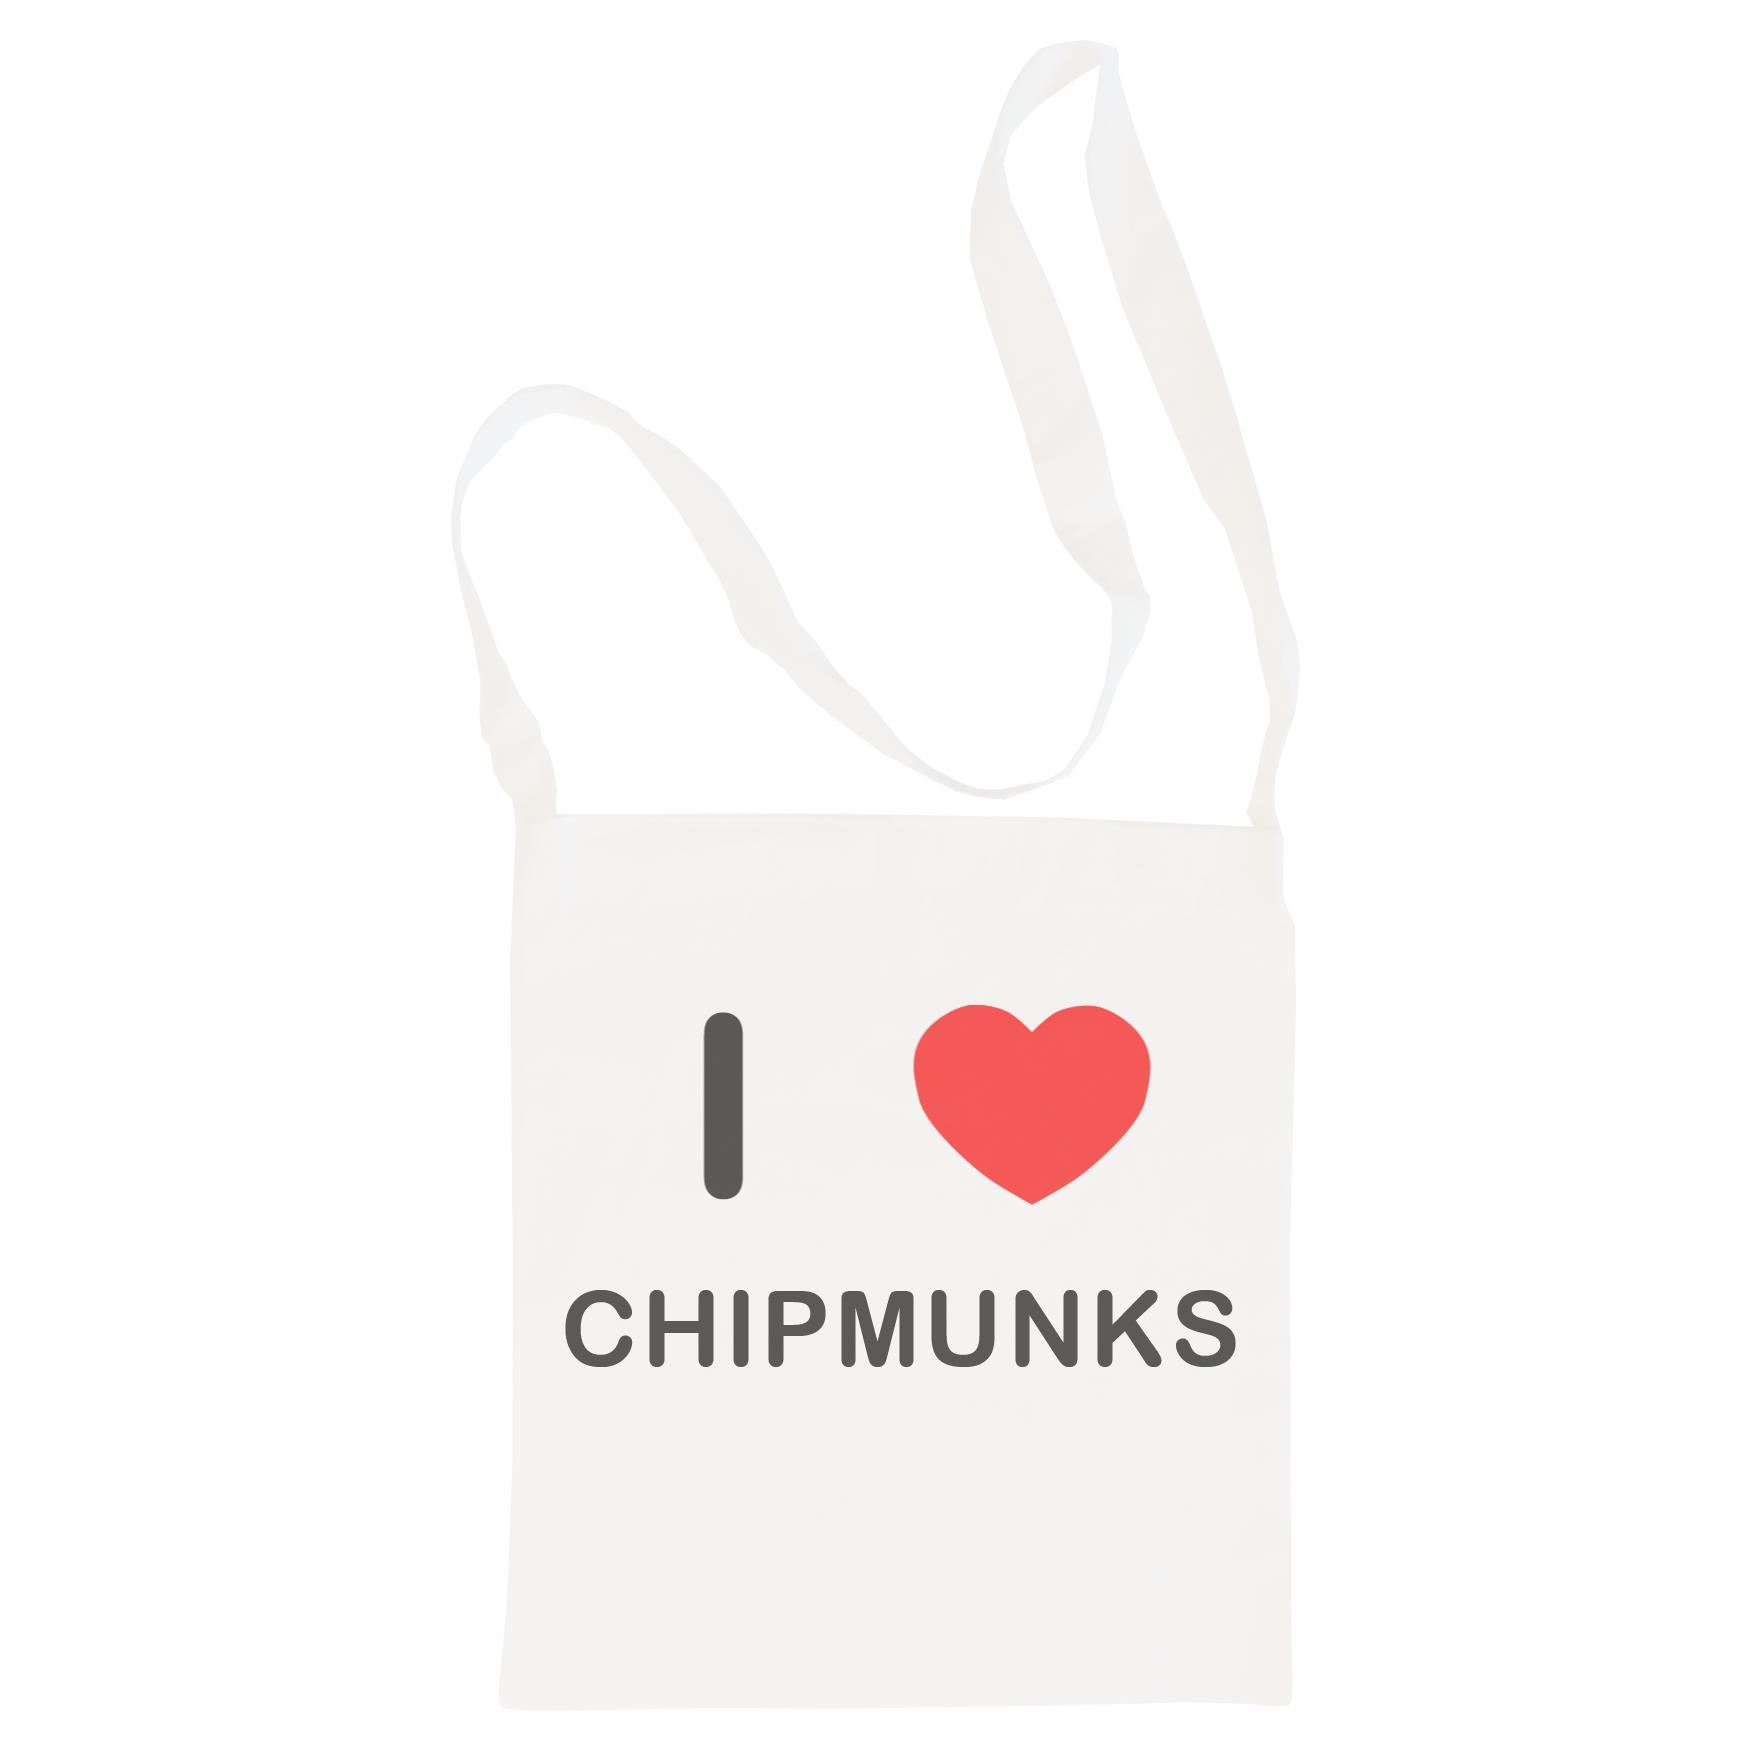 I Love Chipmunks - Cotton Bag | Size choice Tote, Shopper or Sling